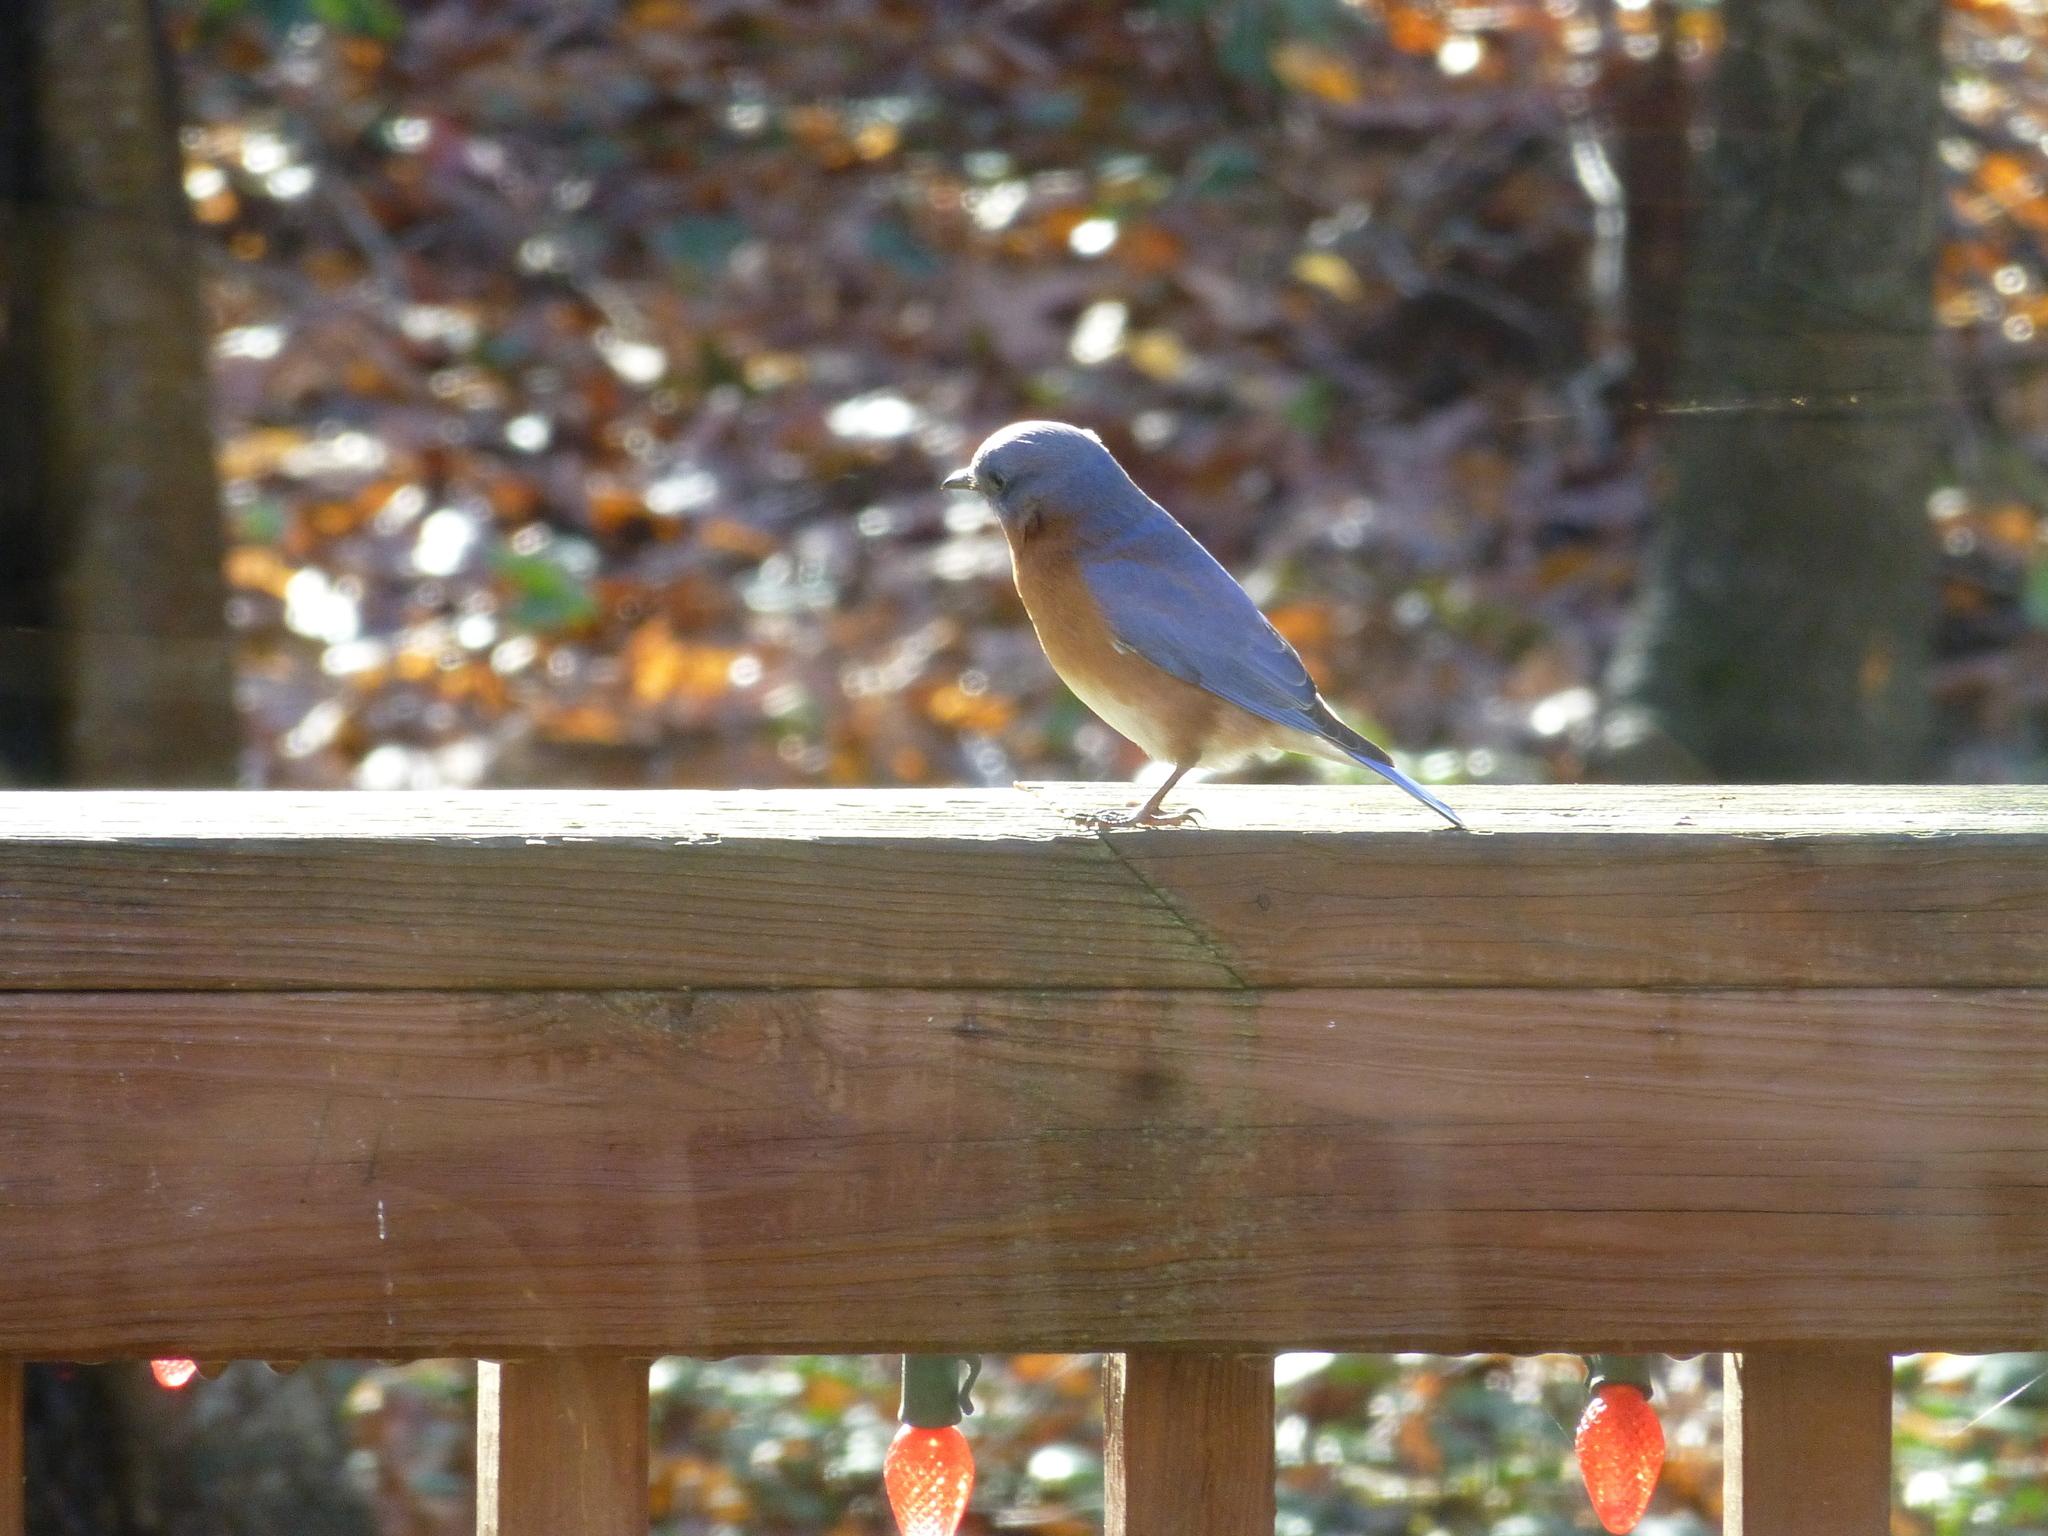 Image of Eastern Bluebird